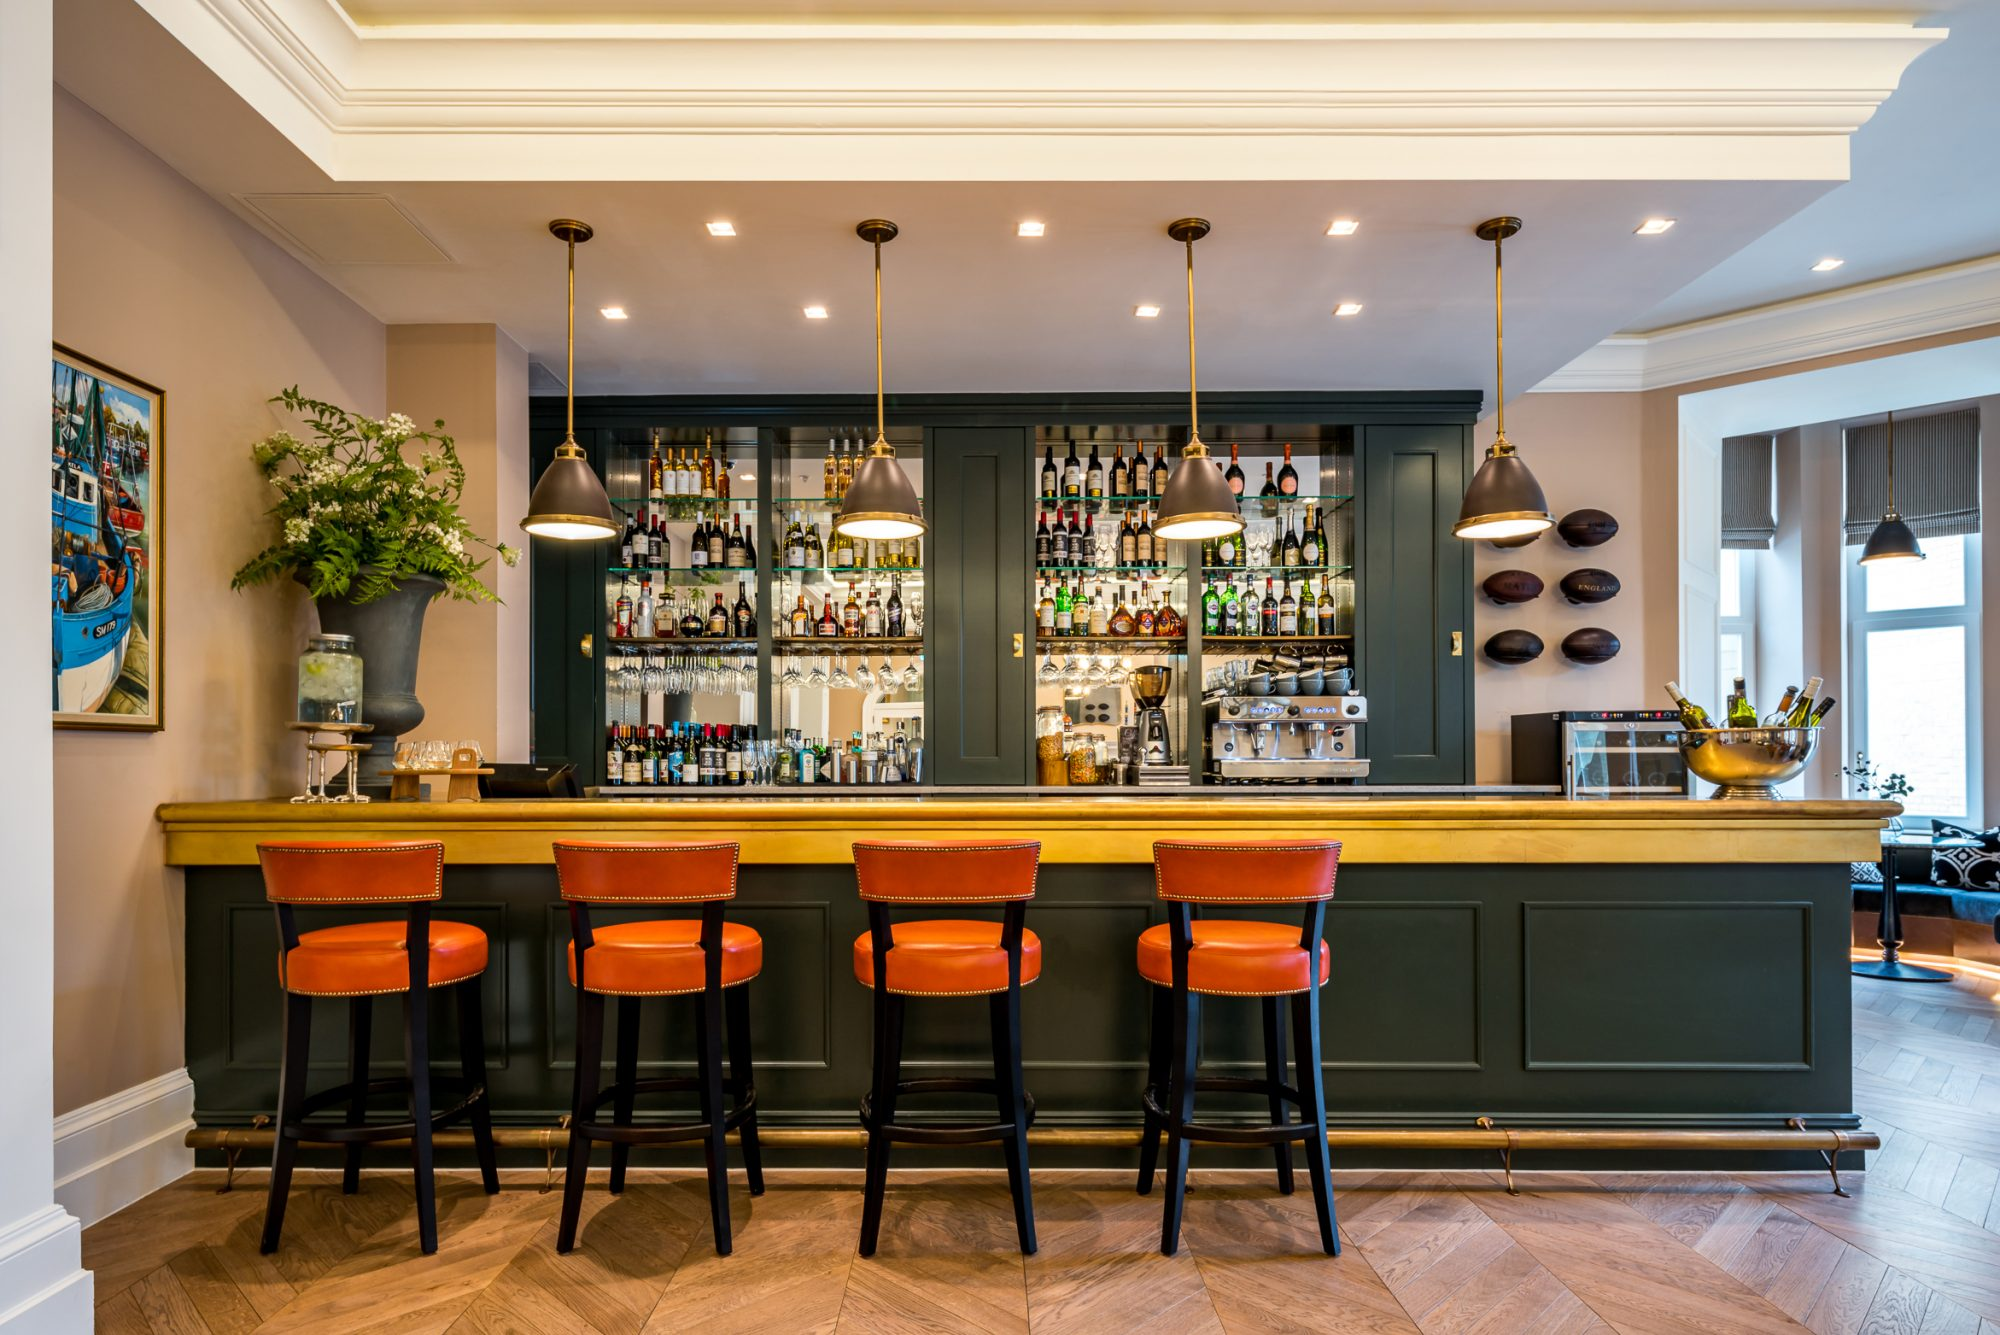 4-Coopers bar bistro 2